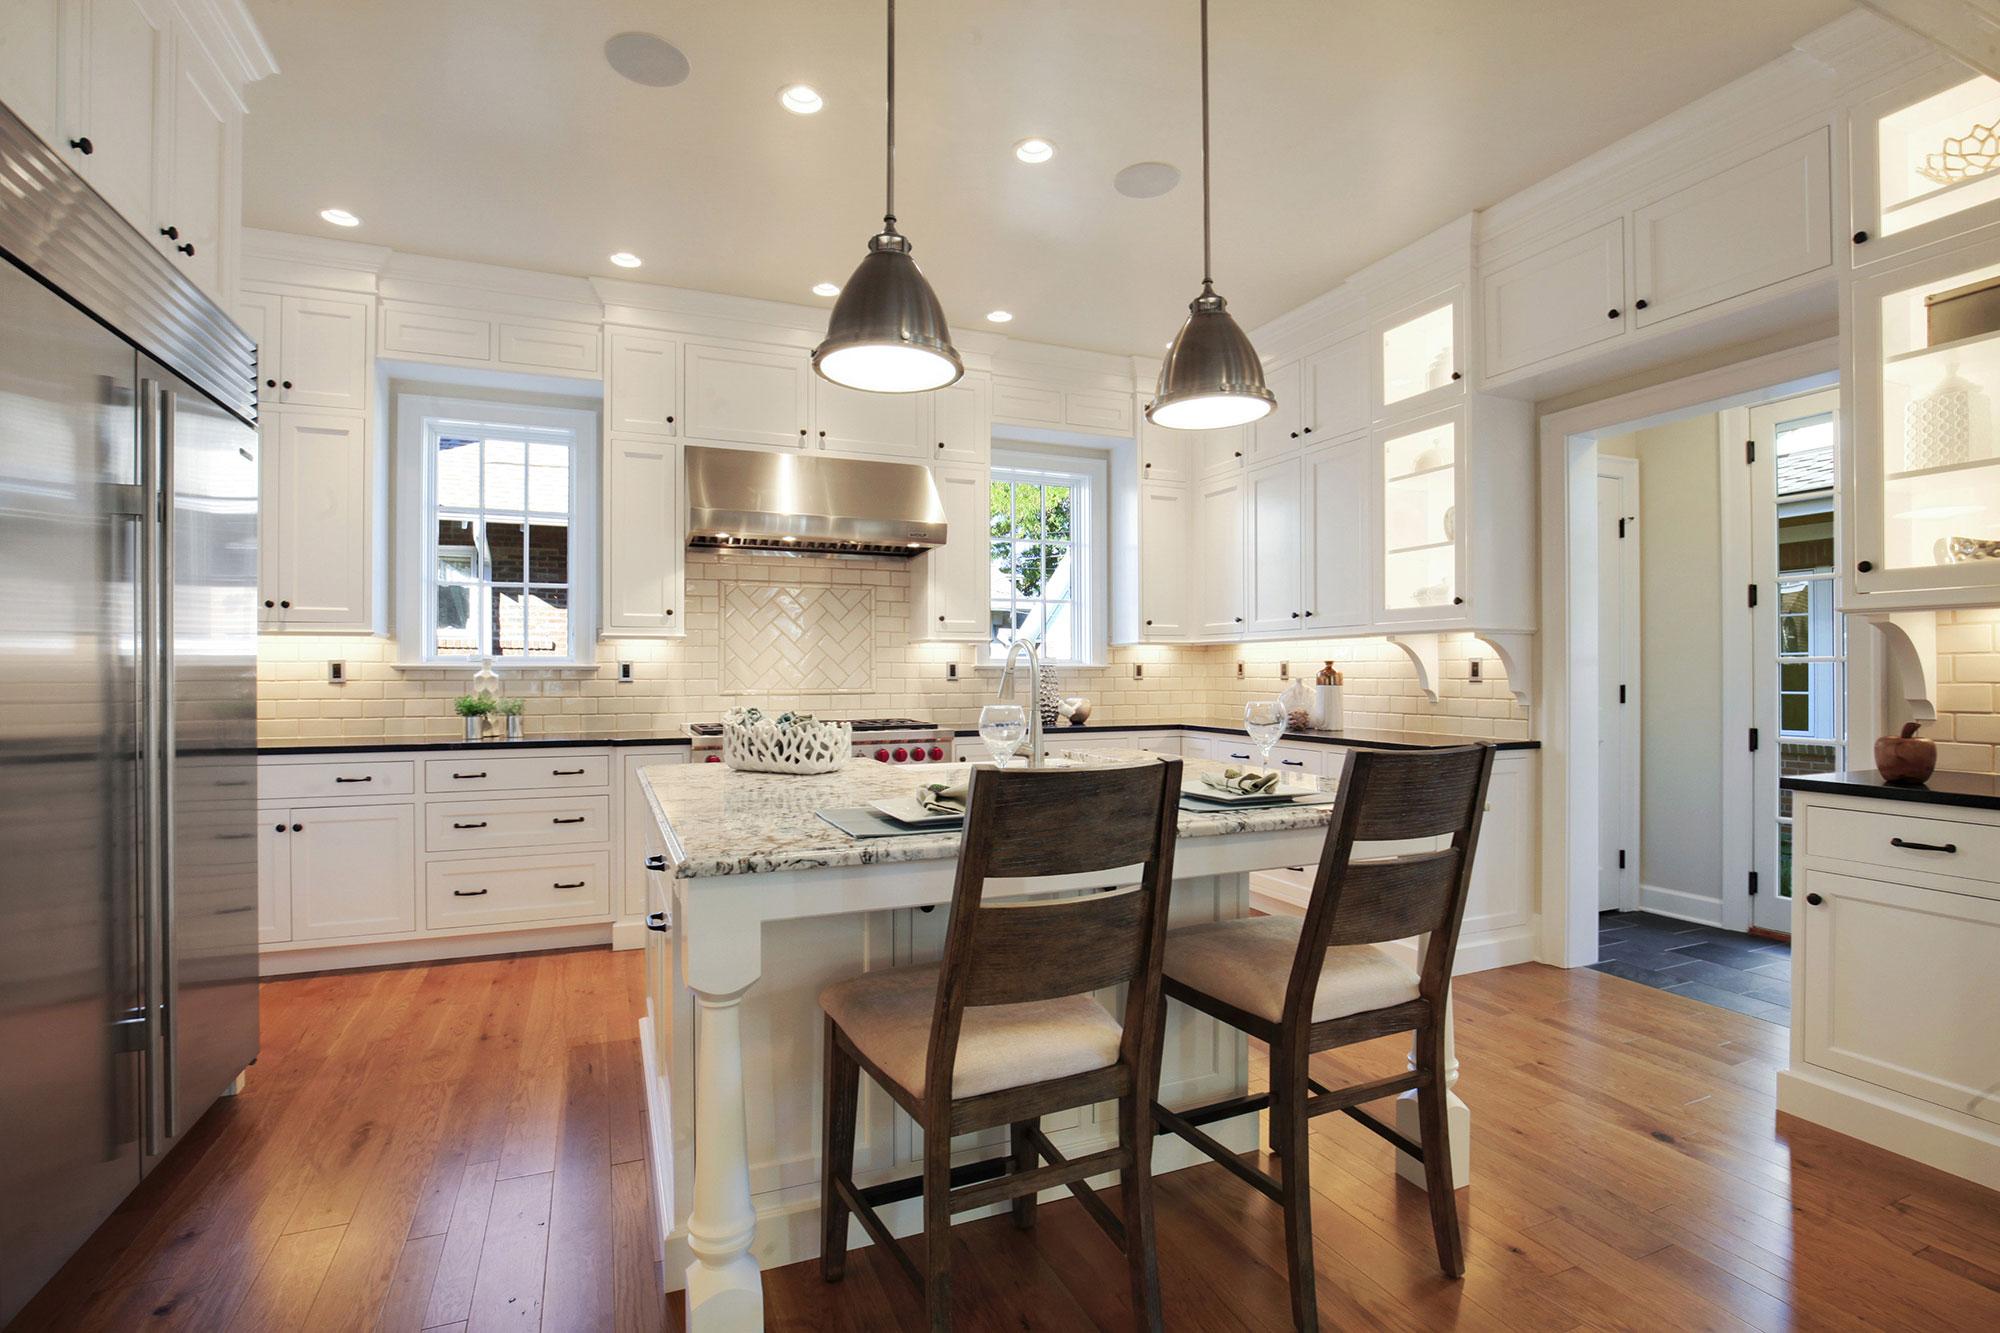 White Shaker Style Farmhouse Kitchen - Crystal Cabinets on Kitchen  id=68846